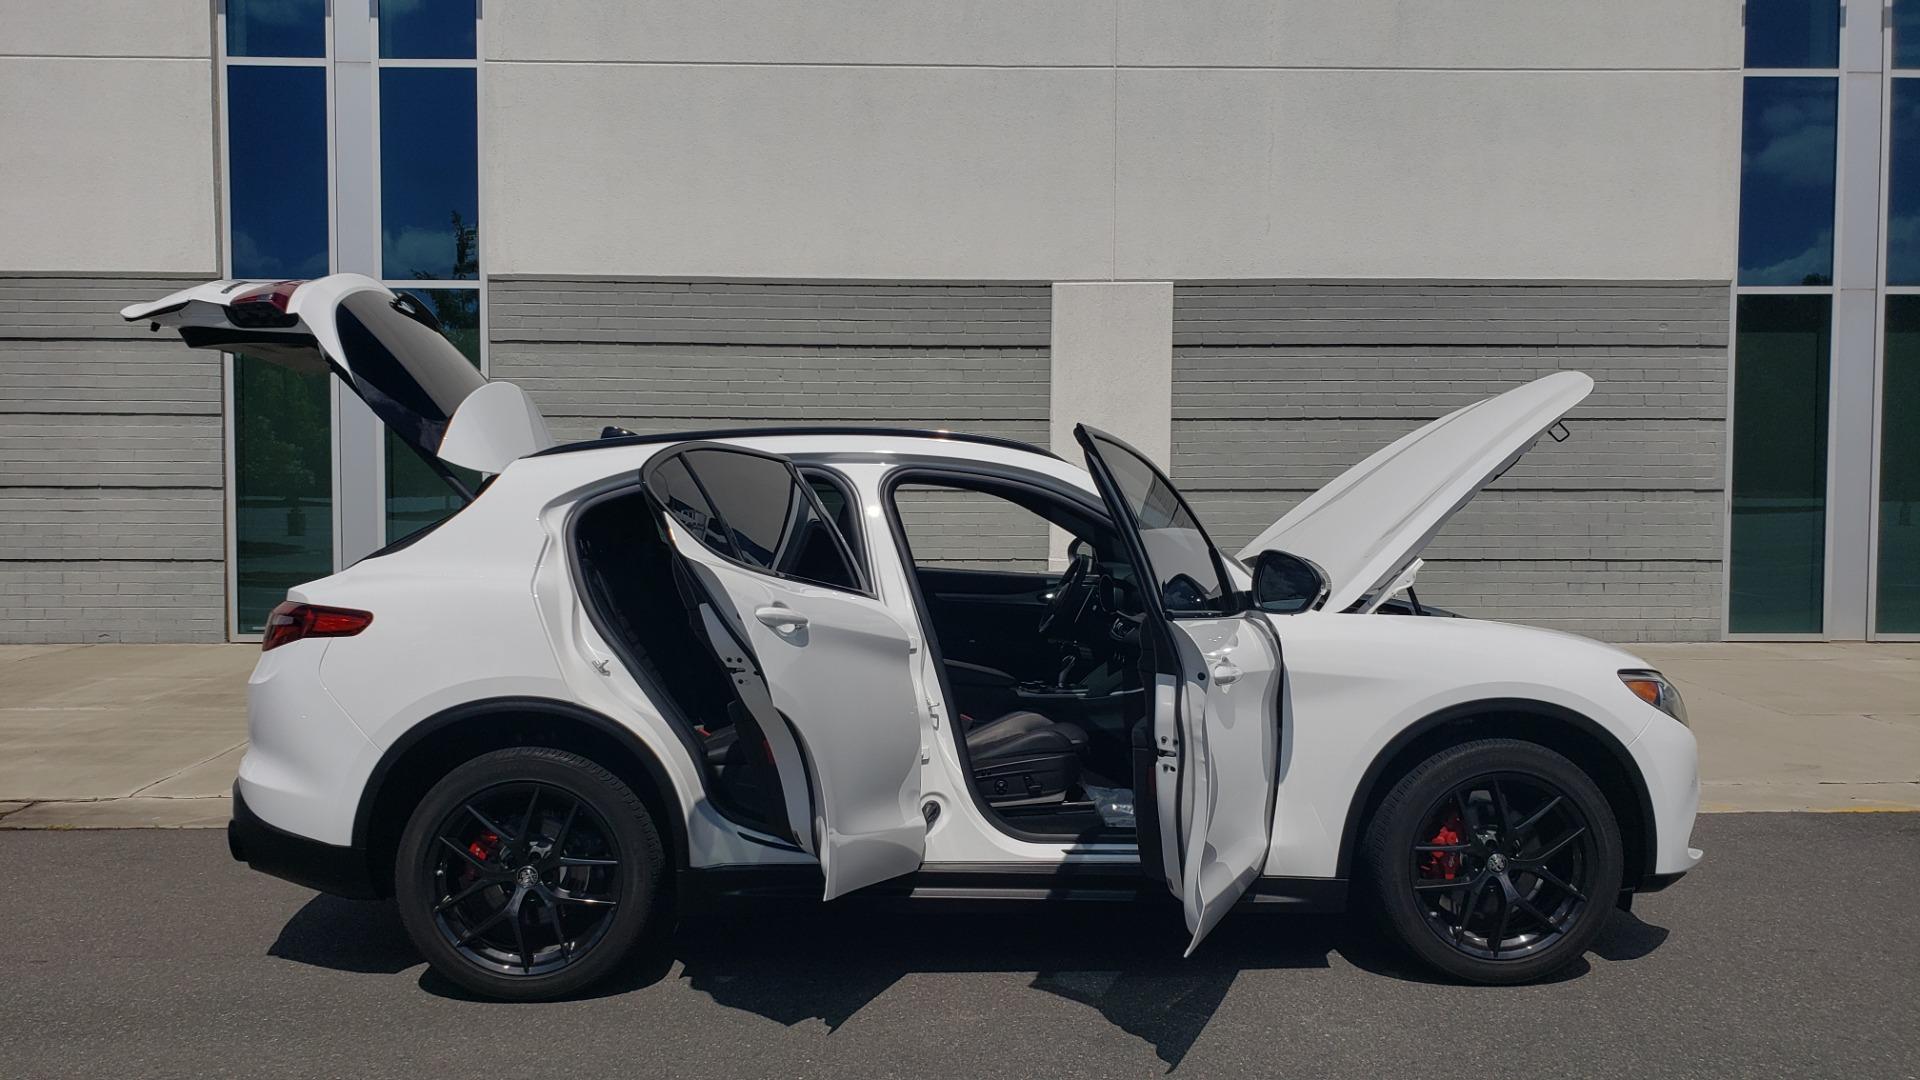 Used 2019 Alfa Romeo STELVIO TI SPORT AWD / 2.0L TURBO / 8-SPD AUTO / DRVR ASST / REARVIEW for sale $37,495 at Formula Imports in Charlotte NC 28227 15